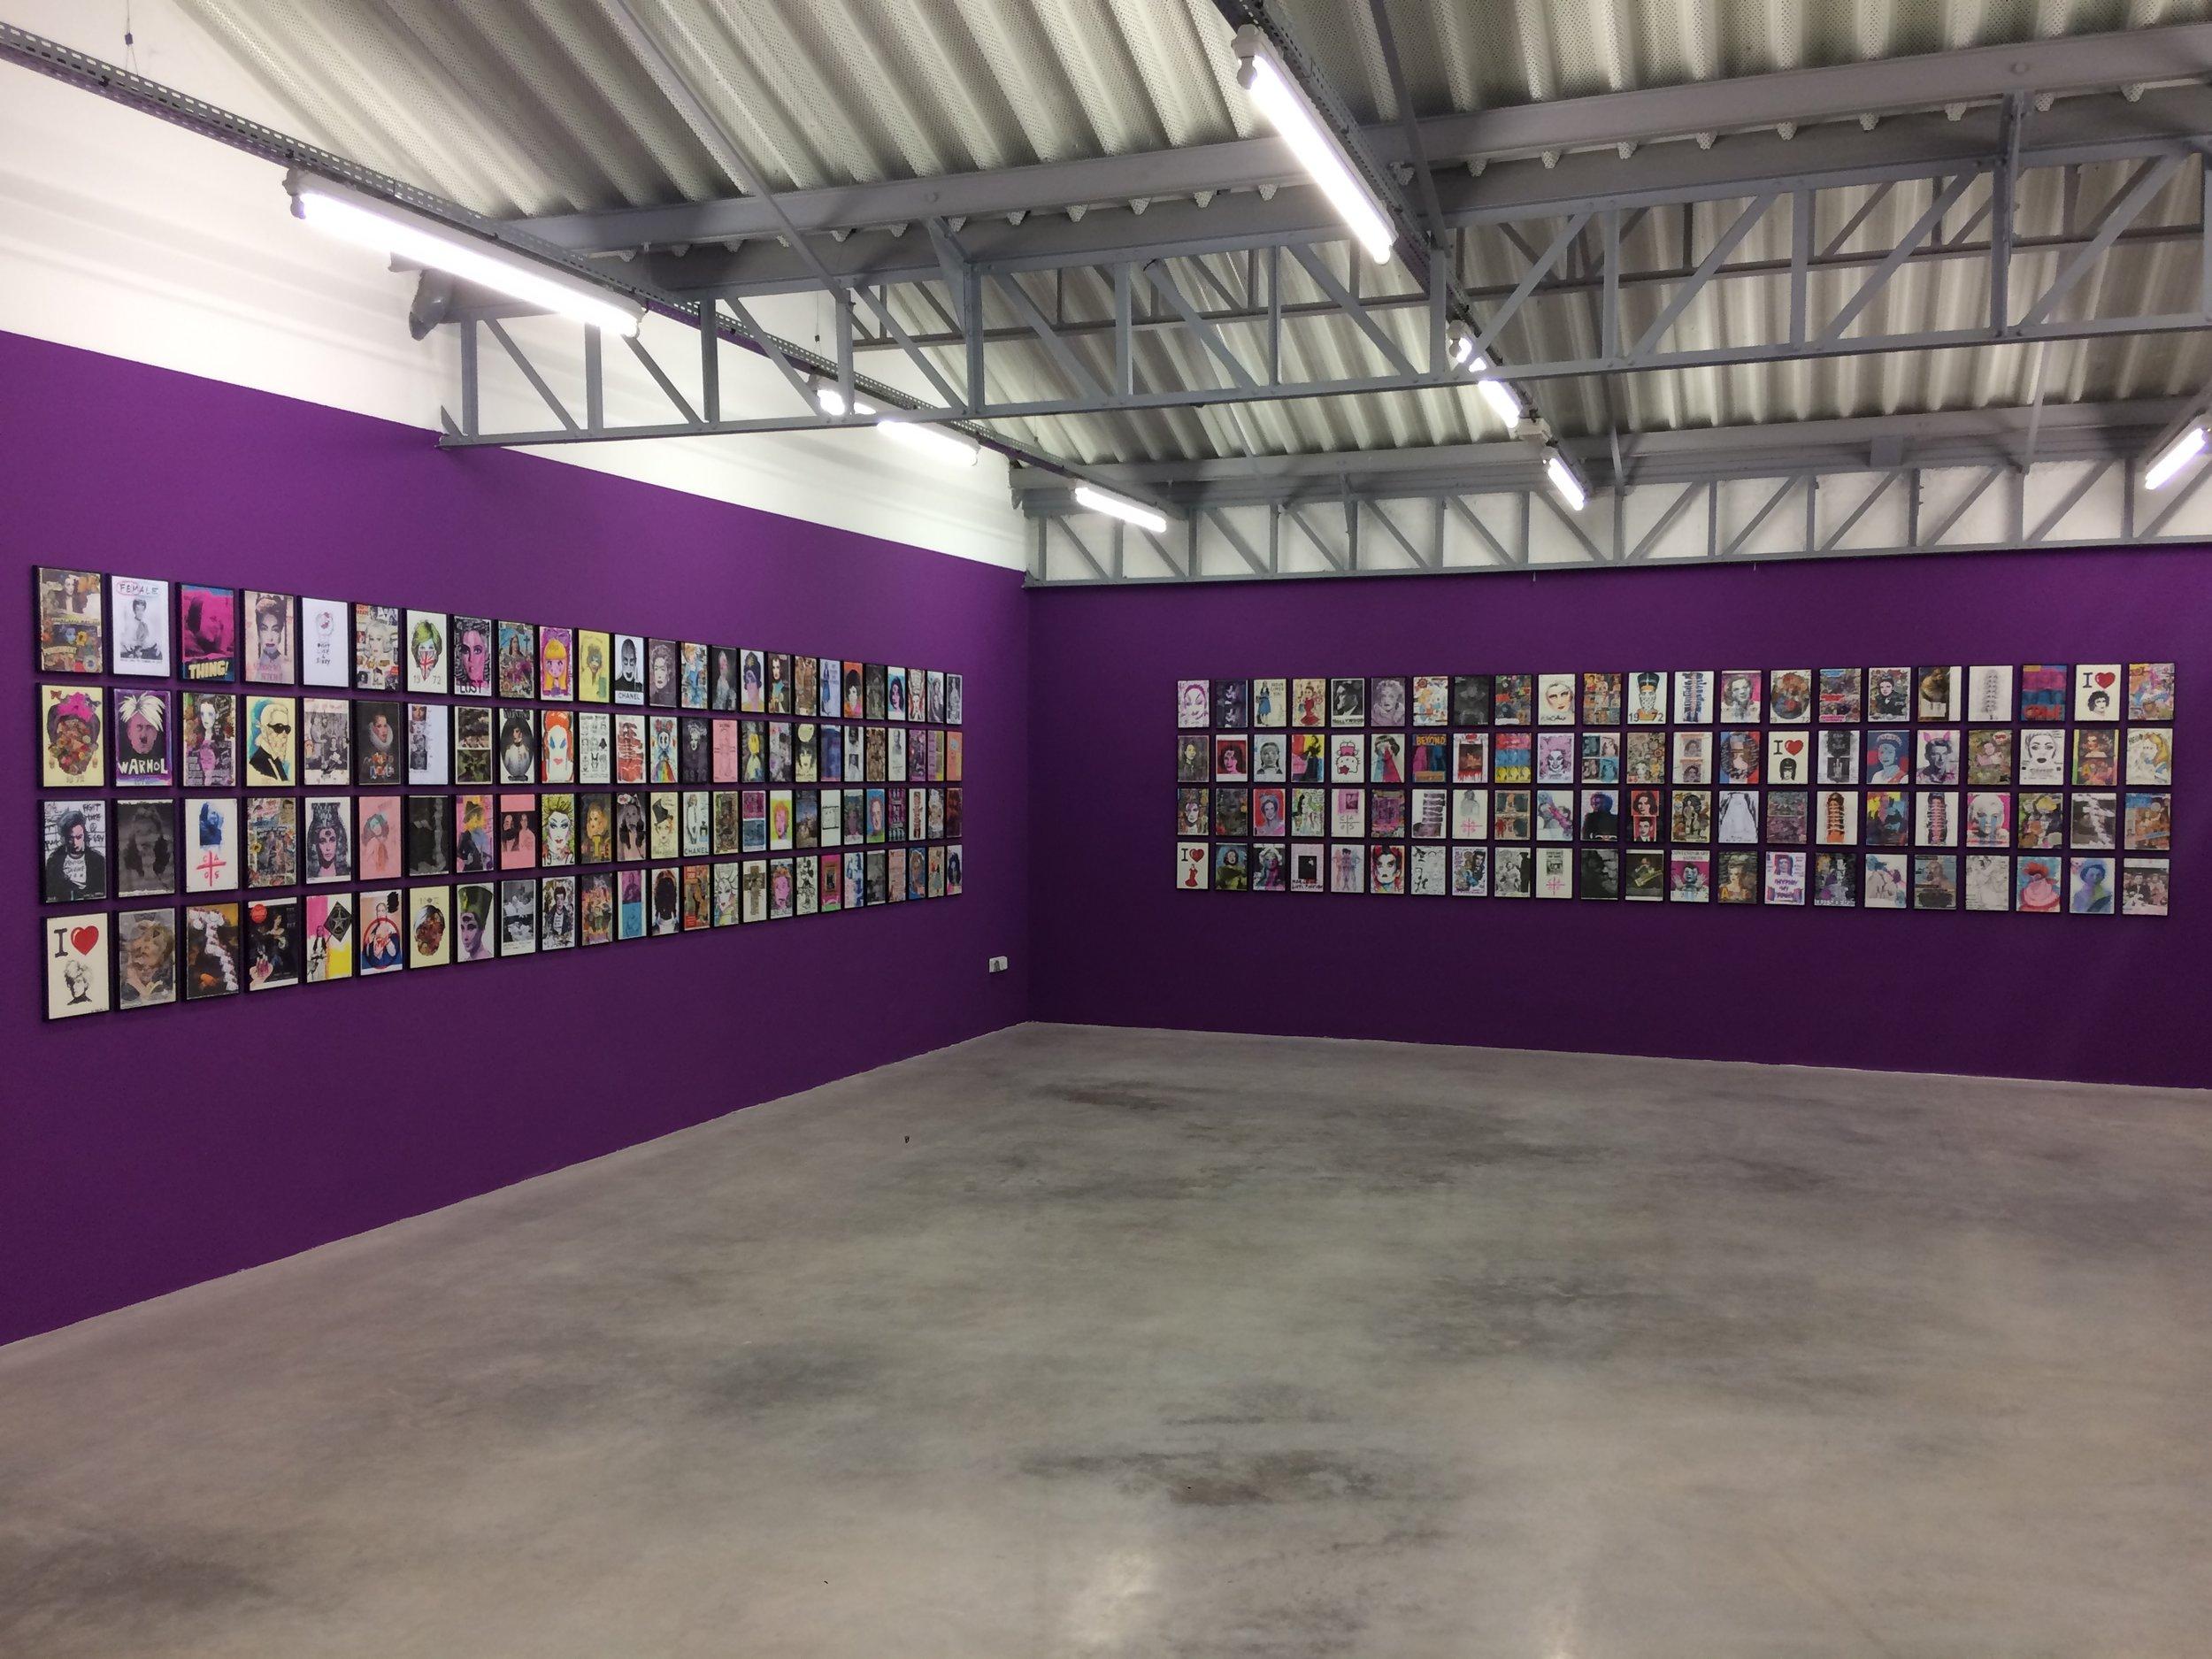 Vue d'exposition,« Legendary Bitches », Roberta Marrero  Transpalette, Bourges  Photo : CT